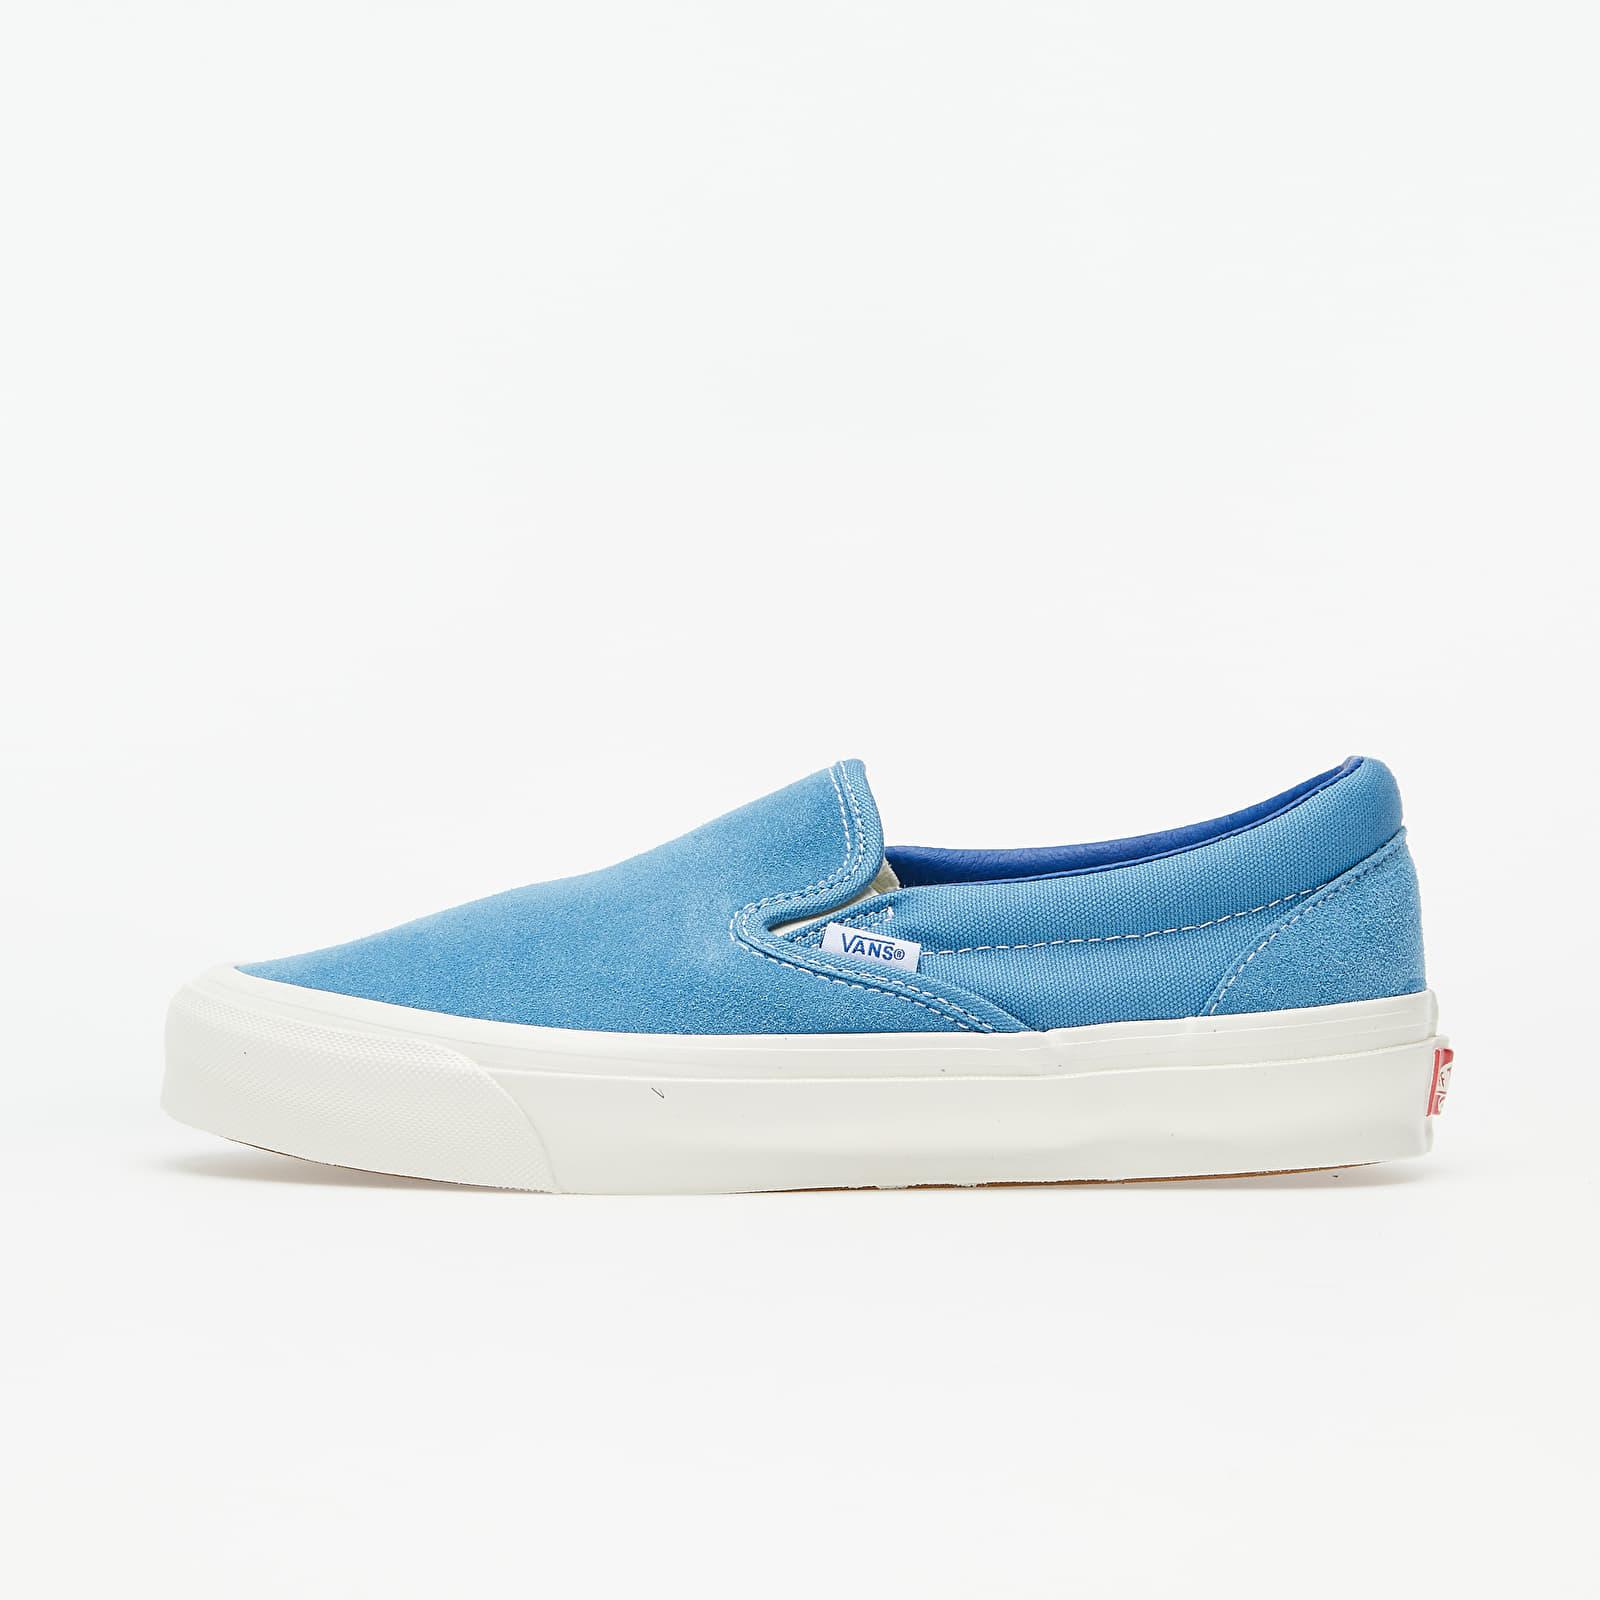 Men's shoes Vans OG Classic Slip-On (Suede/ Canvas) Night Raind